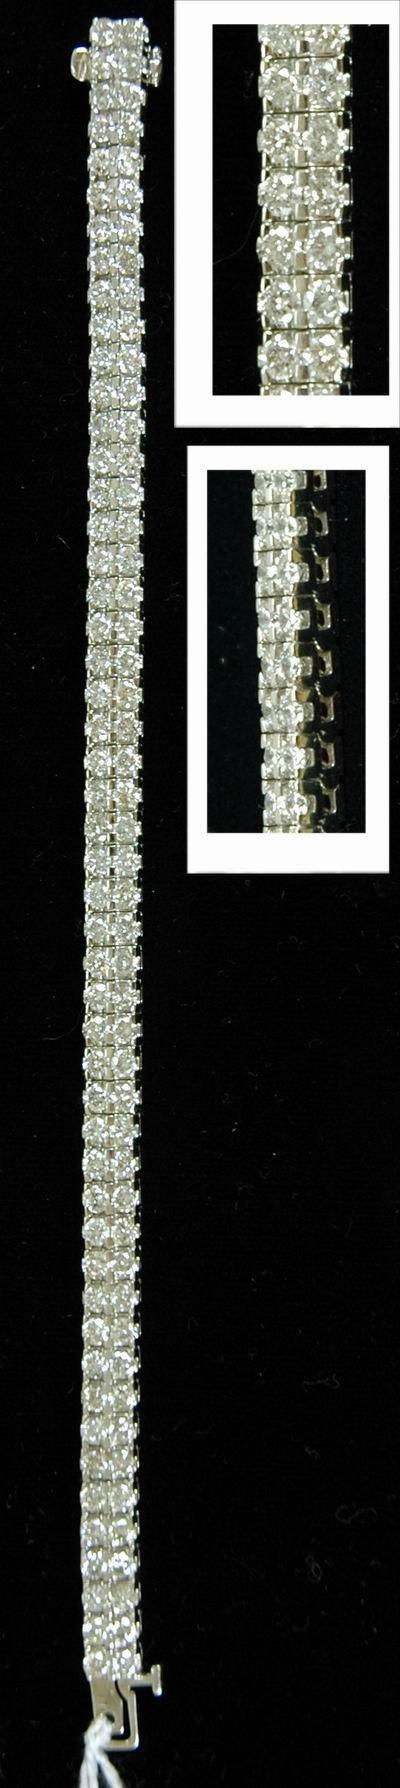 320E: 10.00CT 18KT WHITE GOLD DIAMOND BRACELET